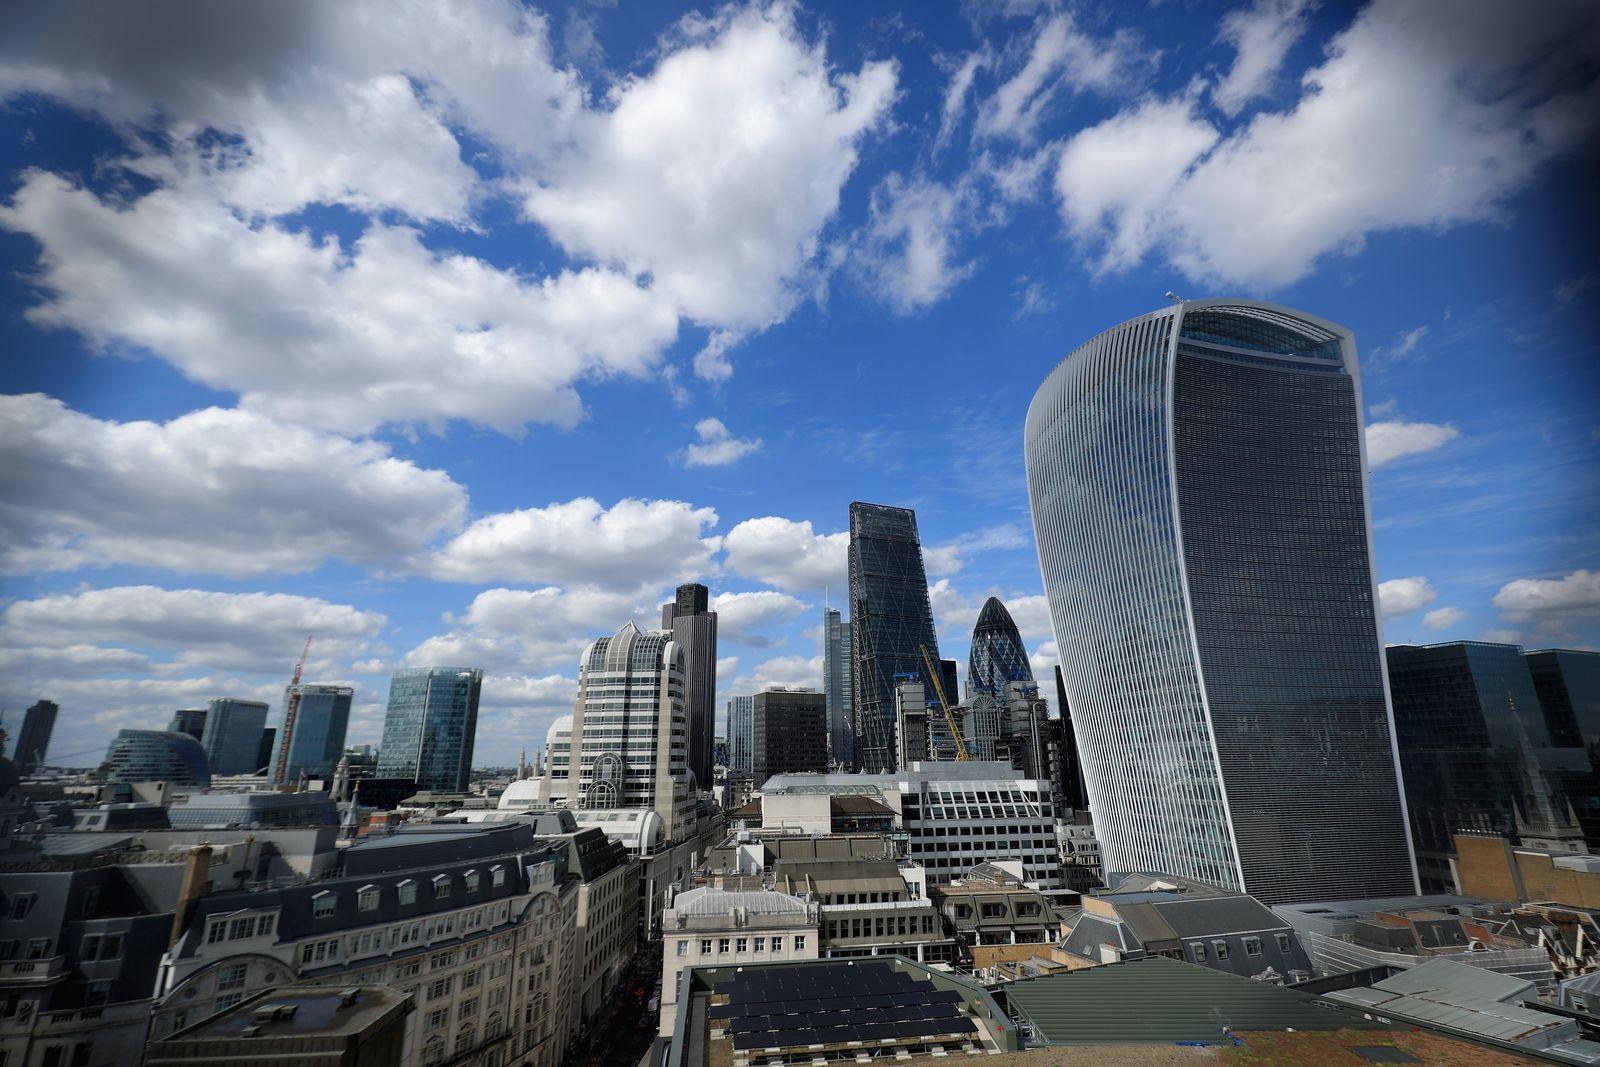 London / Büroviertel / Bürogebäude